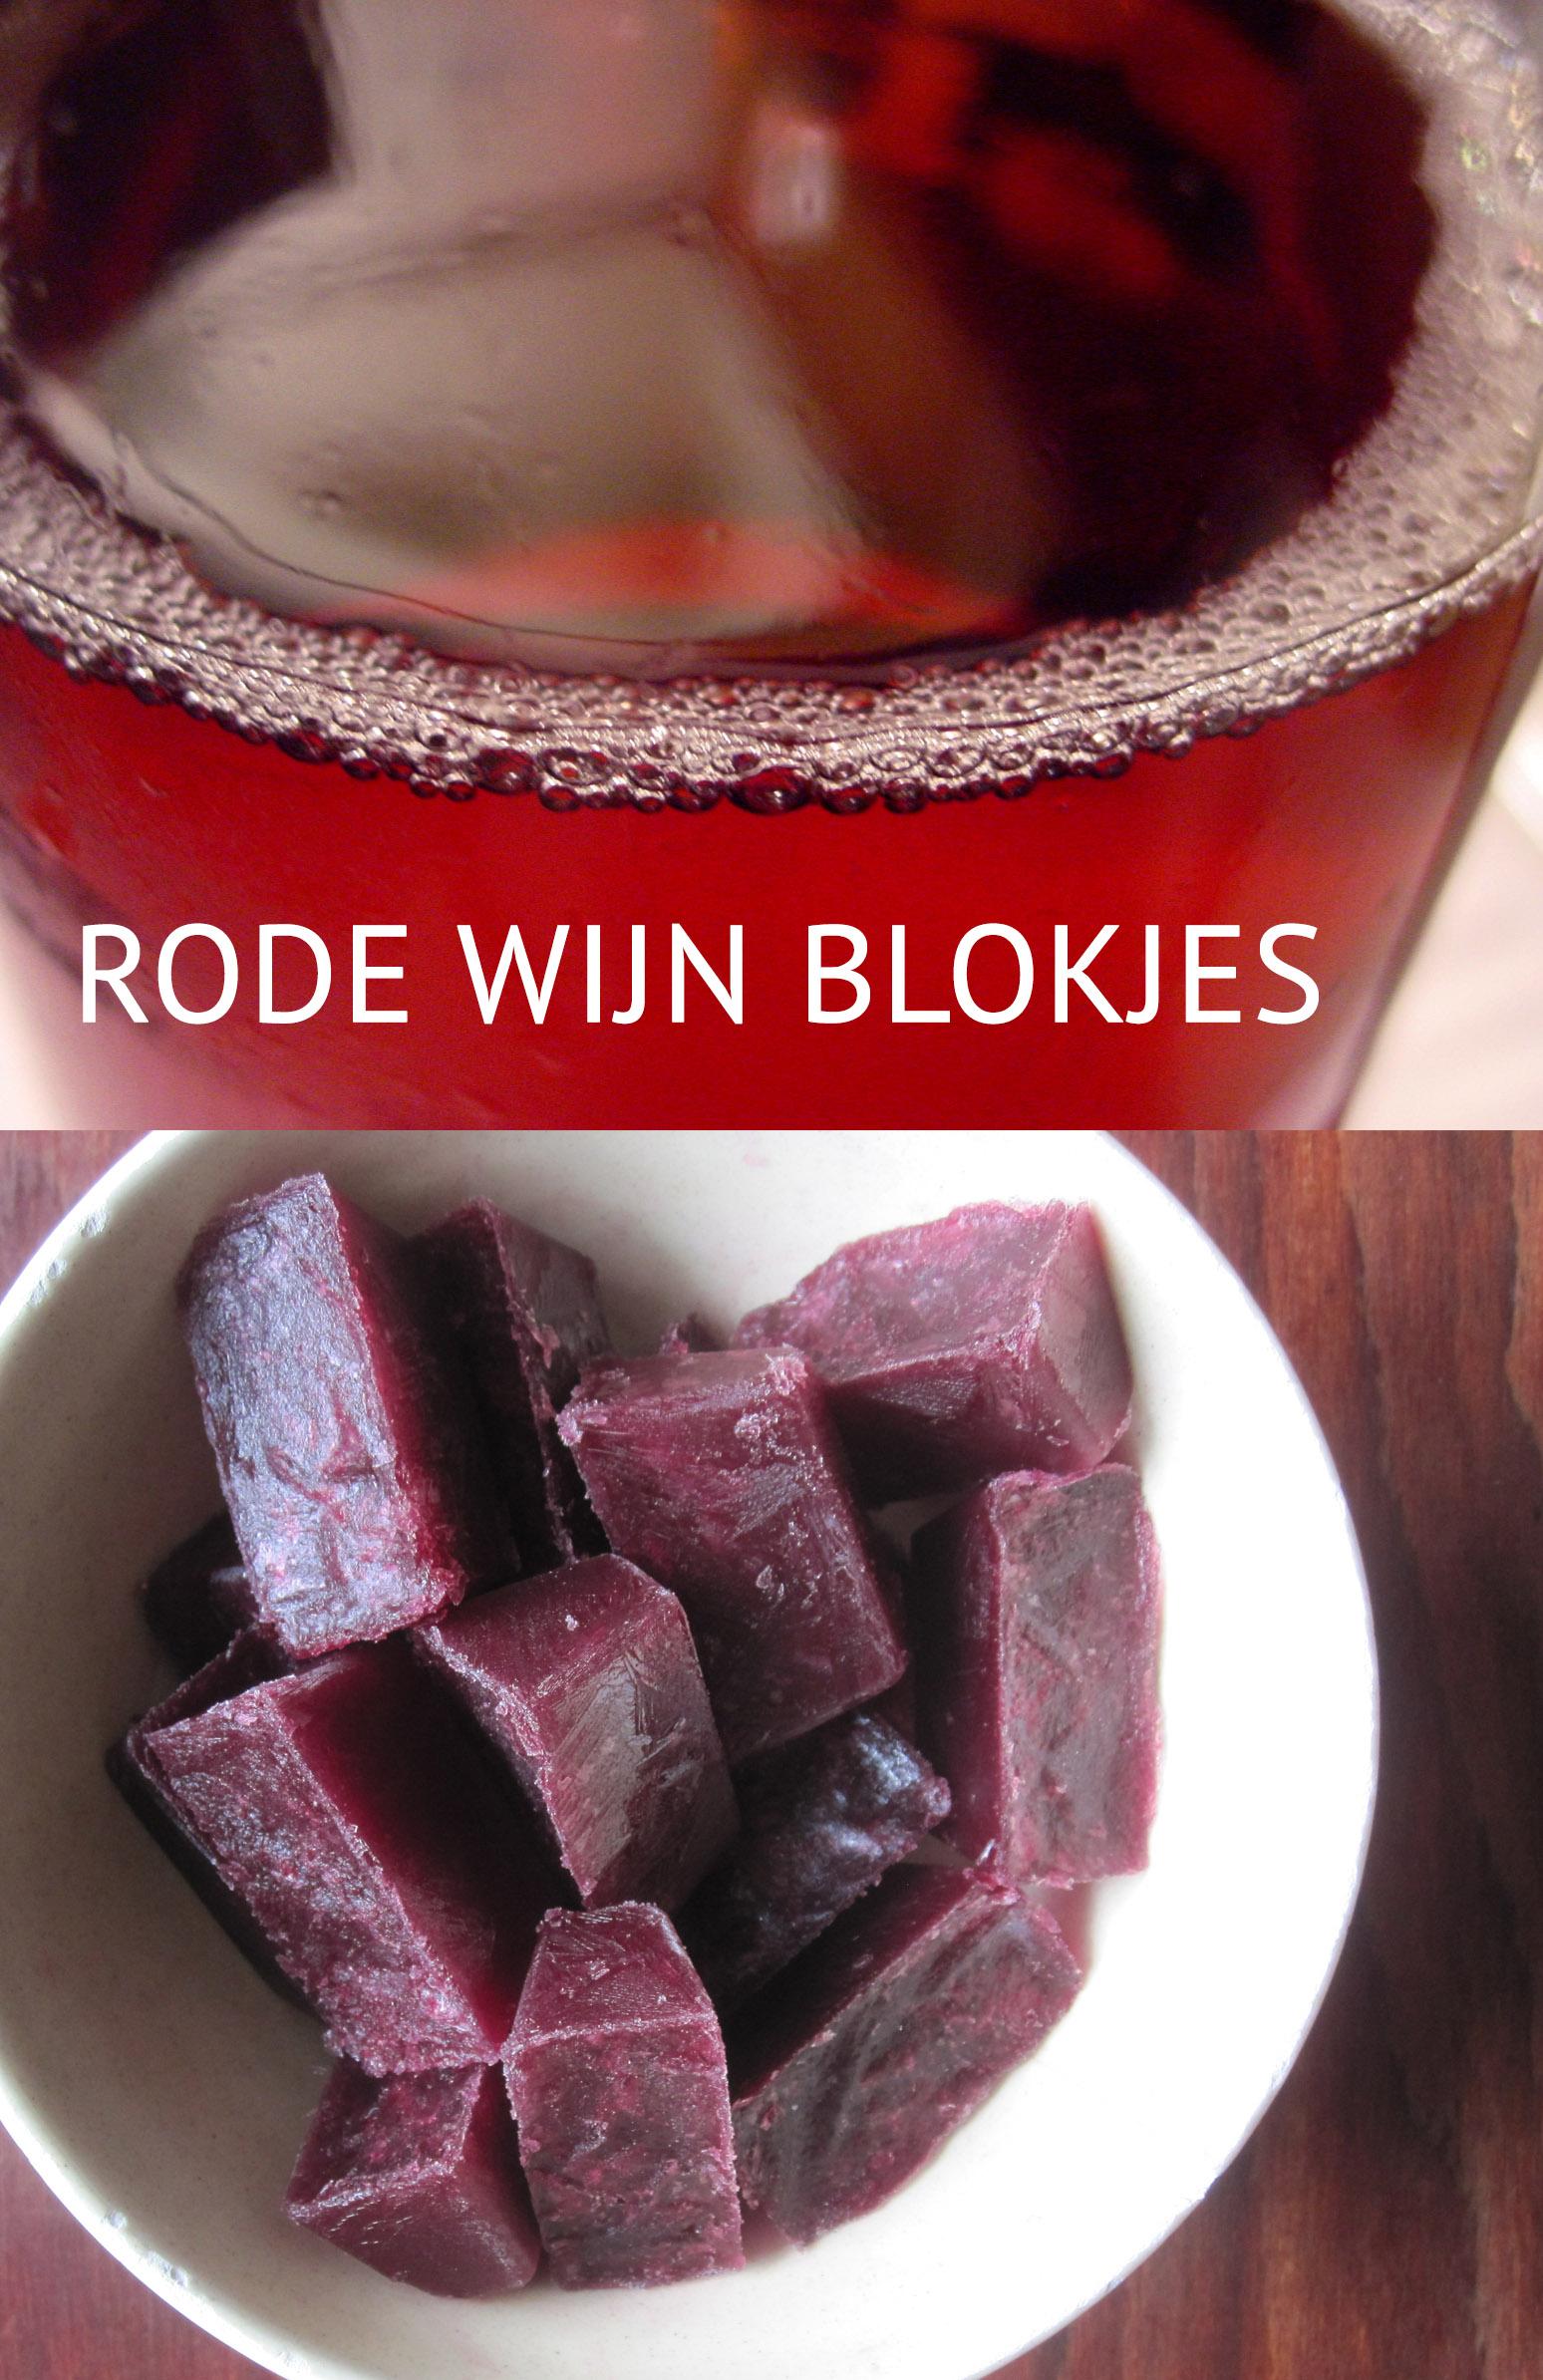 Empty the Frdige - Rode wijn blokjes